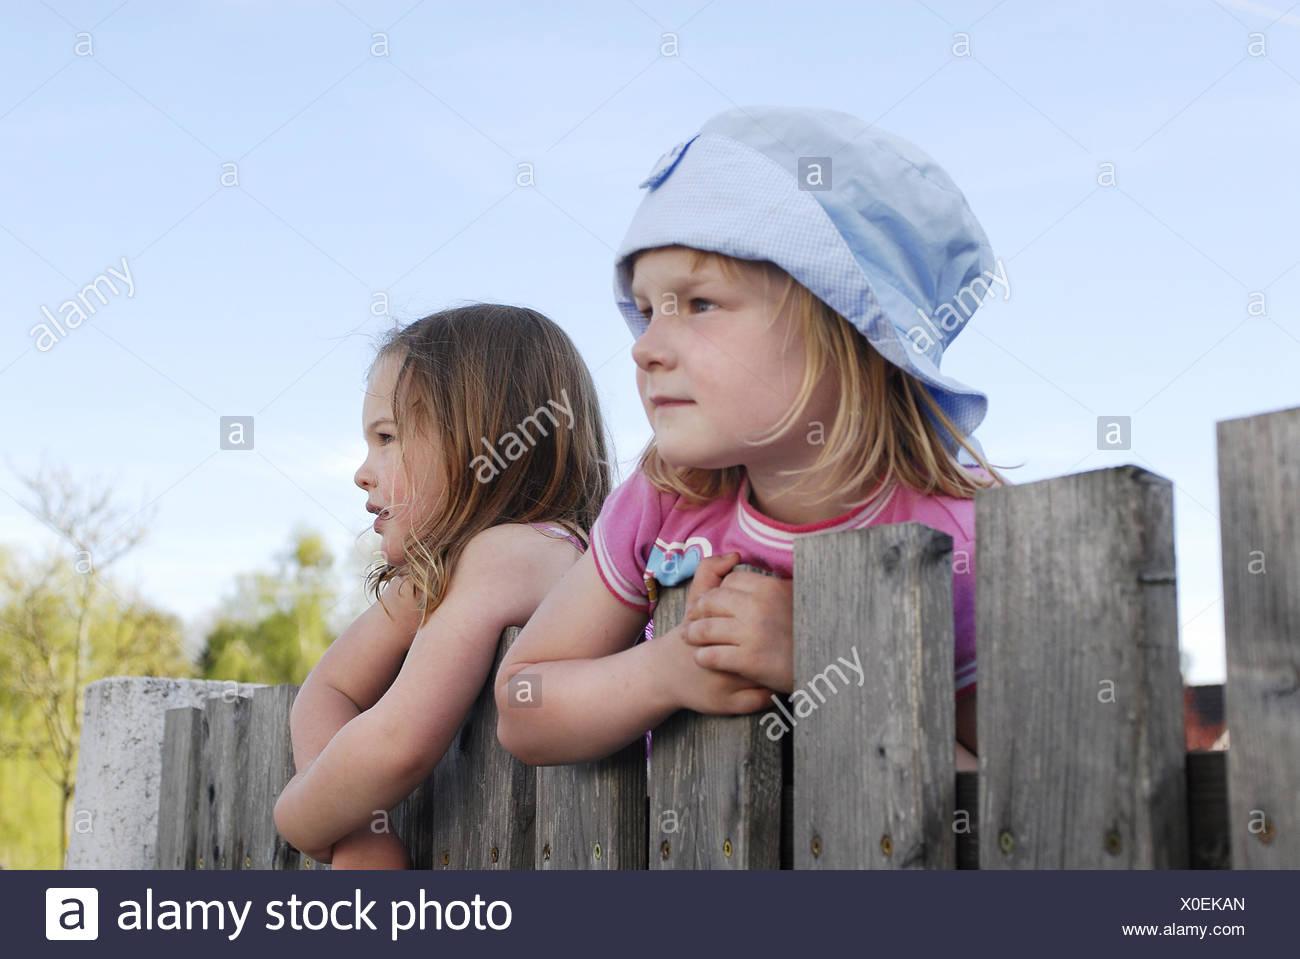 Children, Wooden fence, climb, observe, - Stock Image